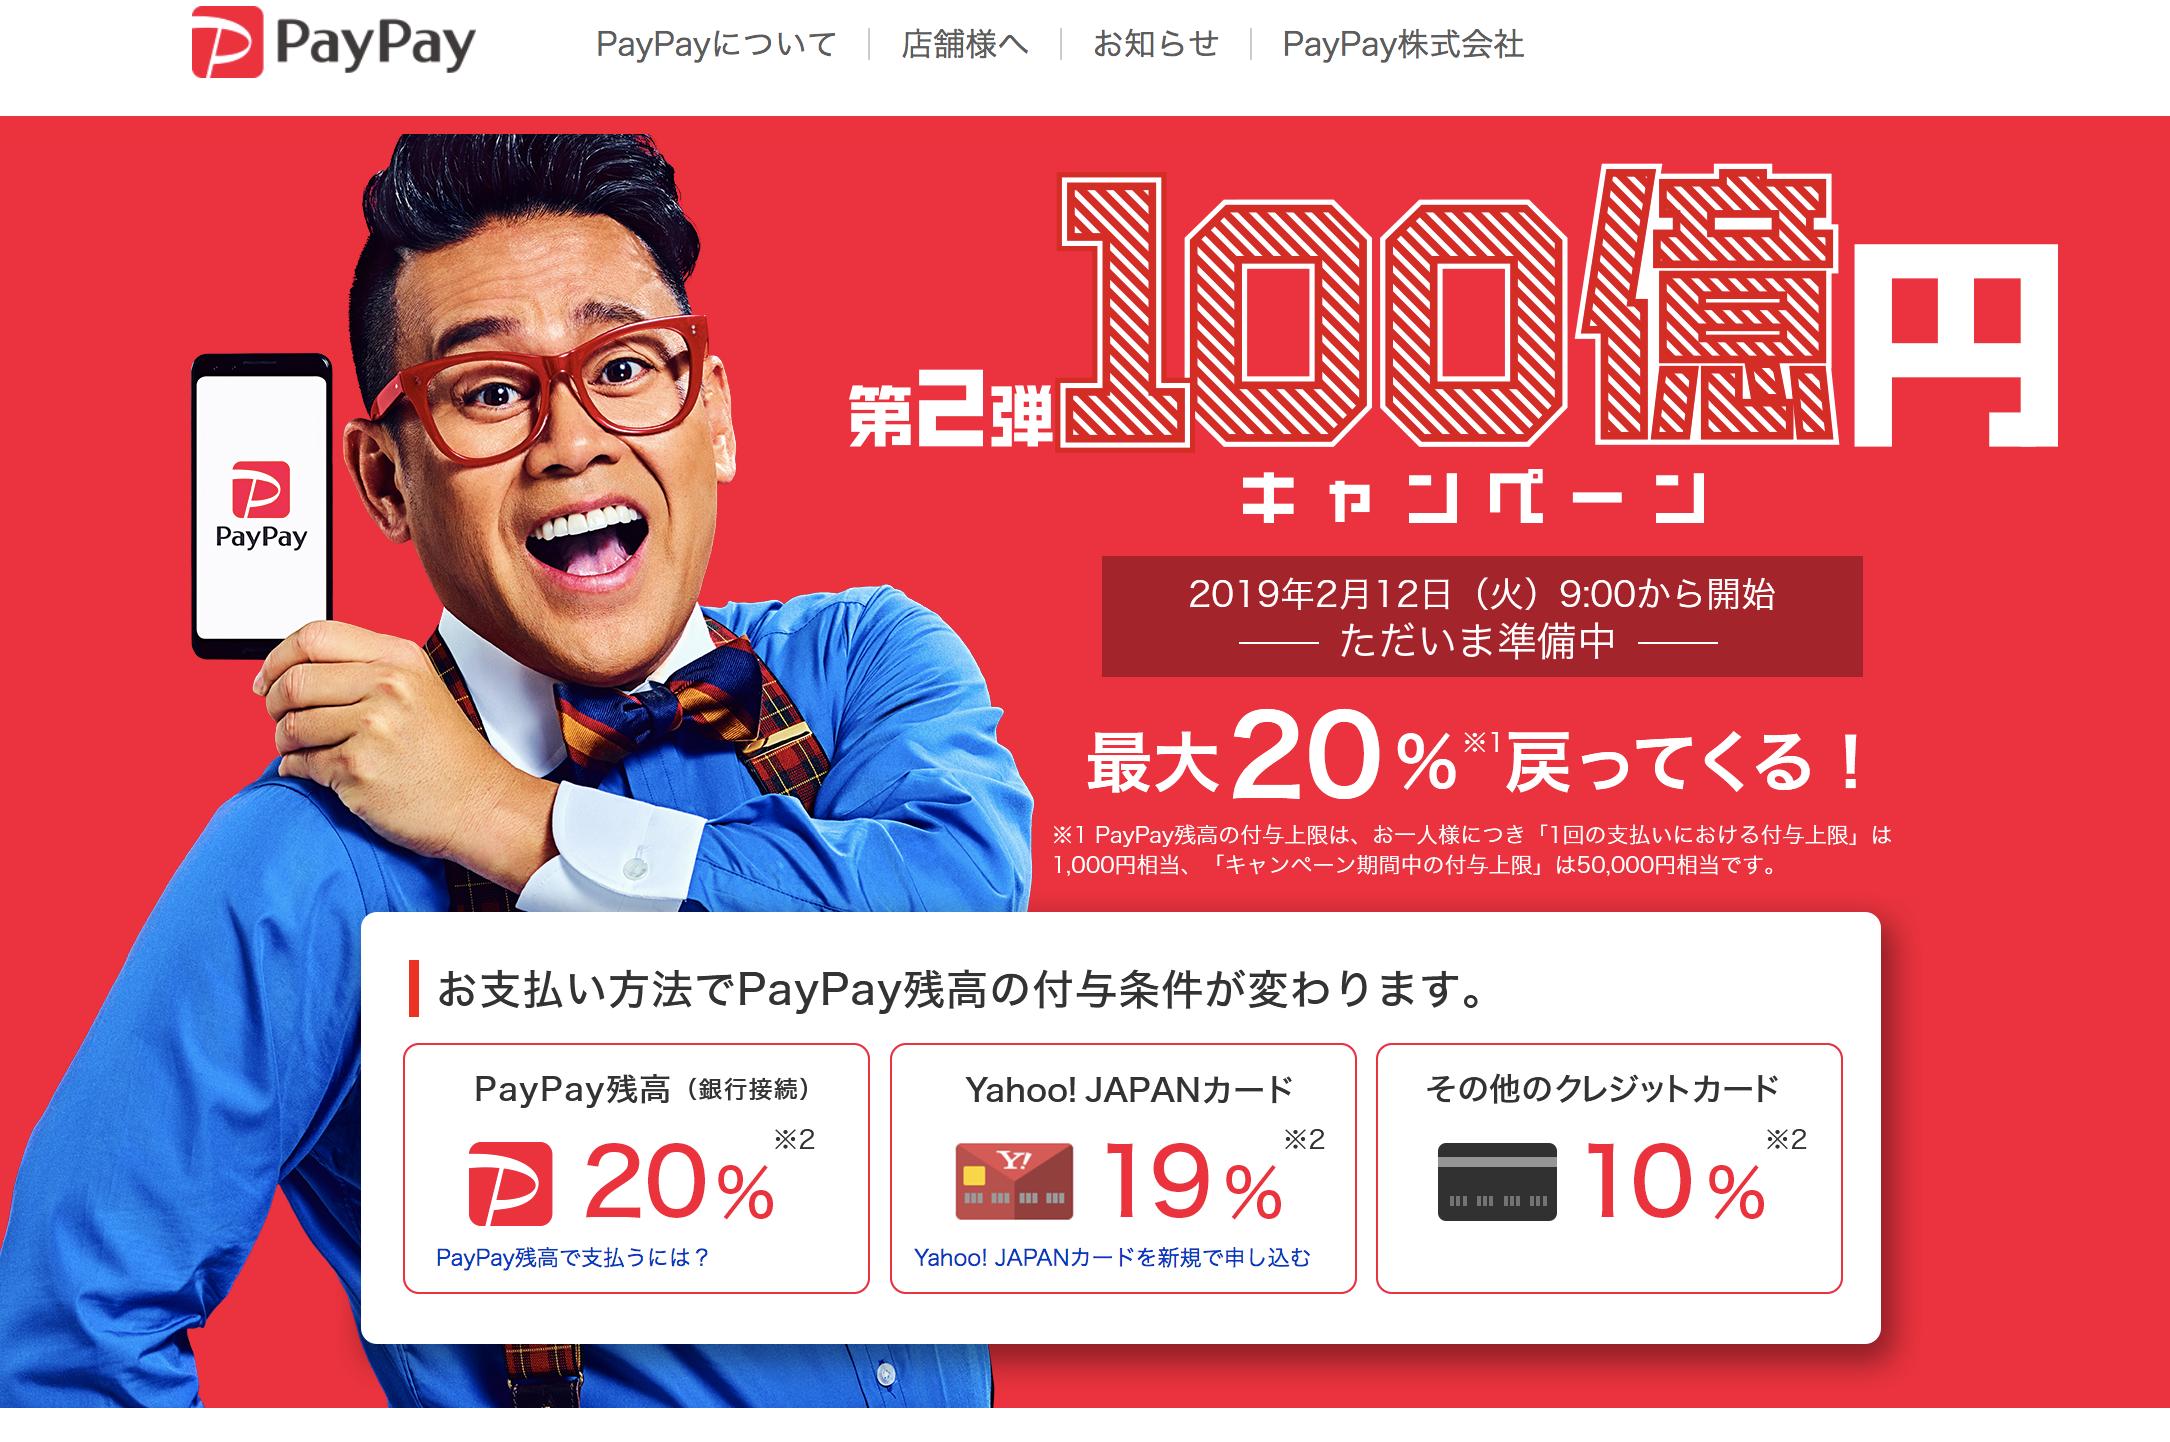 PayPay 100億円キャンペーン 第二弾